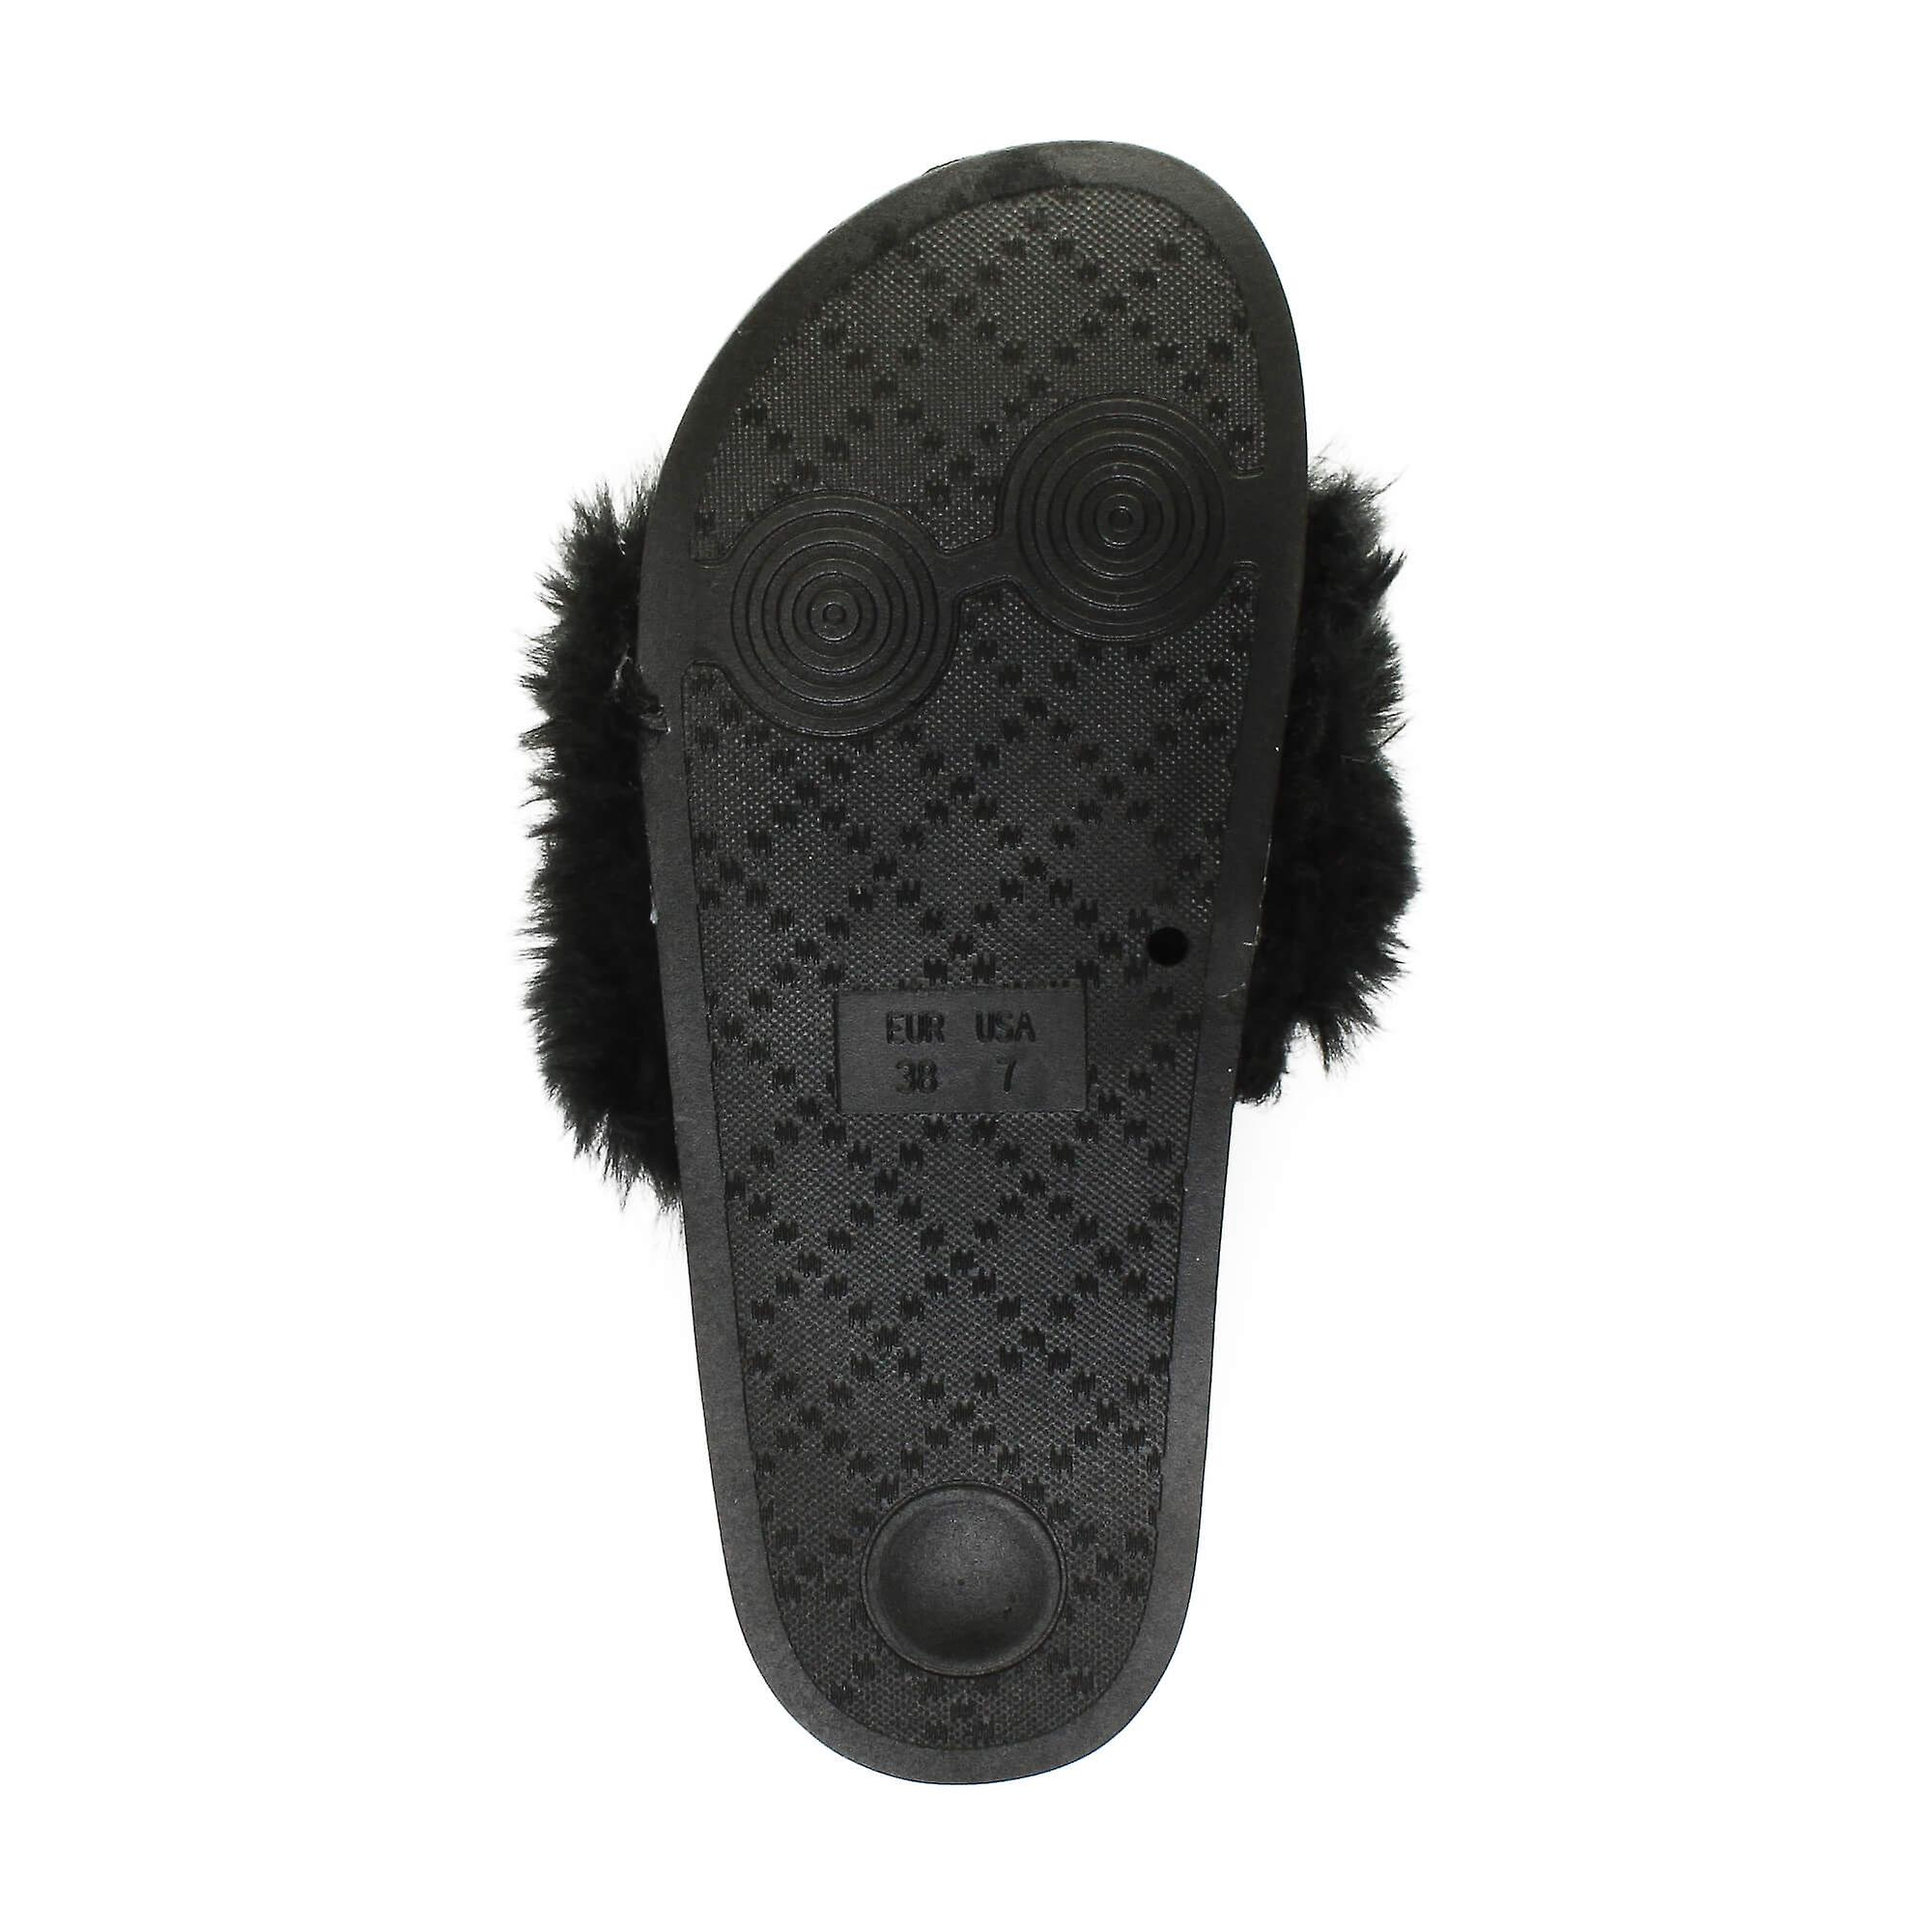 comfort slippers Ajvani open flop flip flat toe womens fur on slip sliders mules sandals comfy rwqC0wFSO